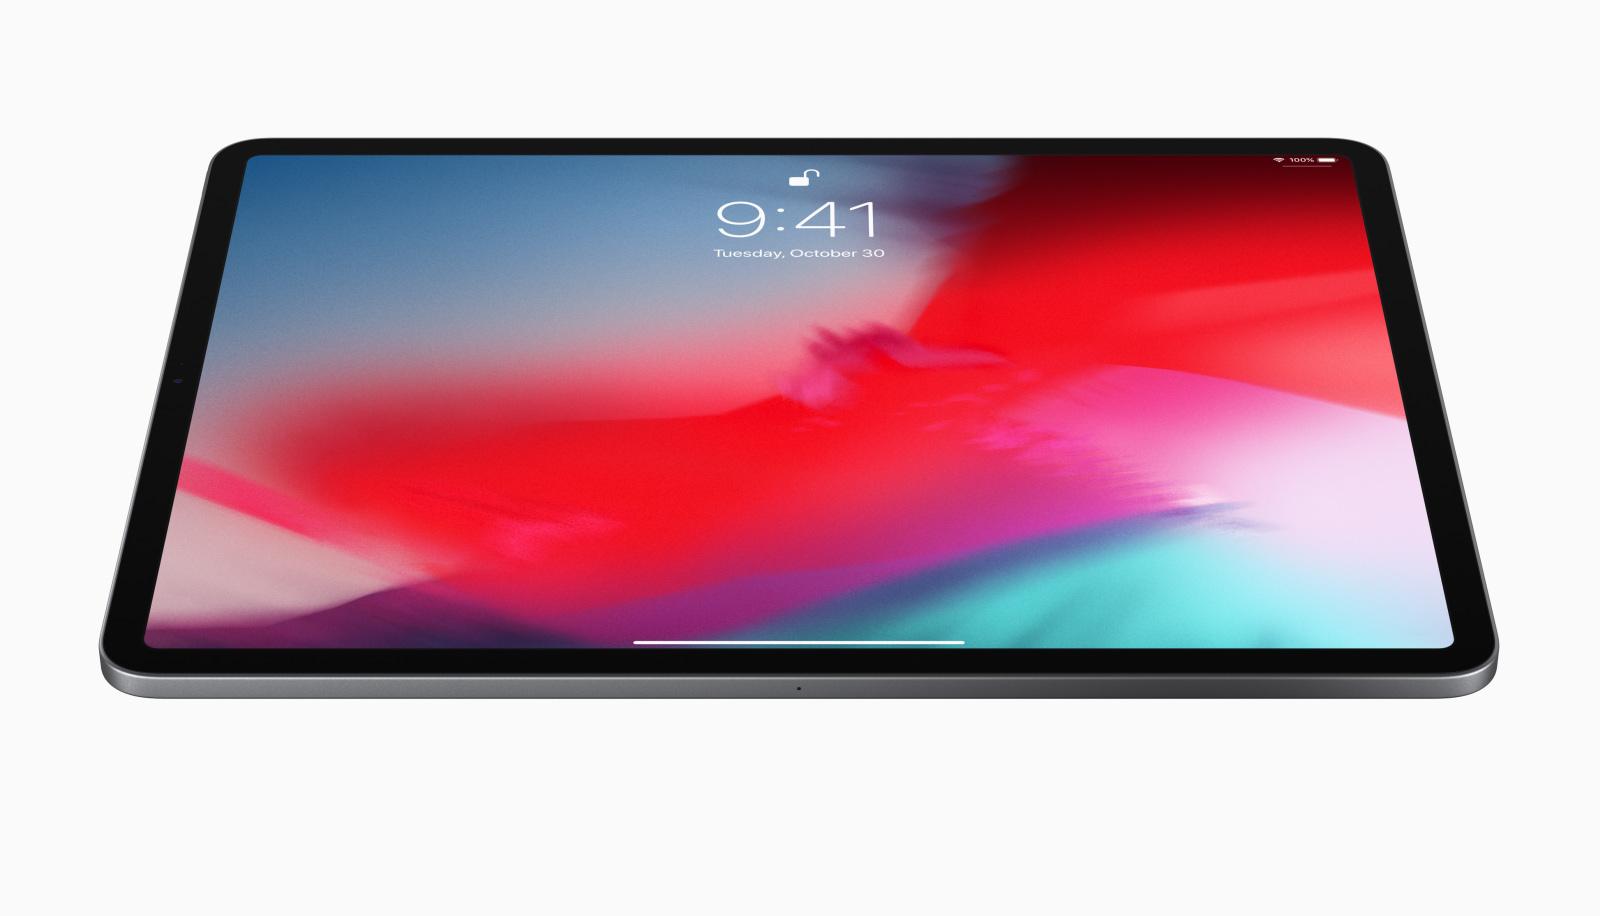 Apple iPad Pro wide screen